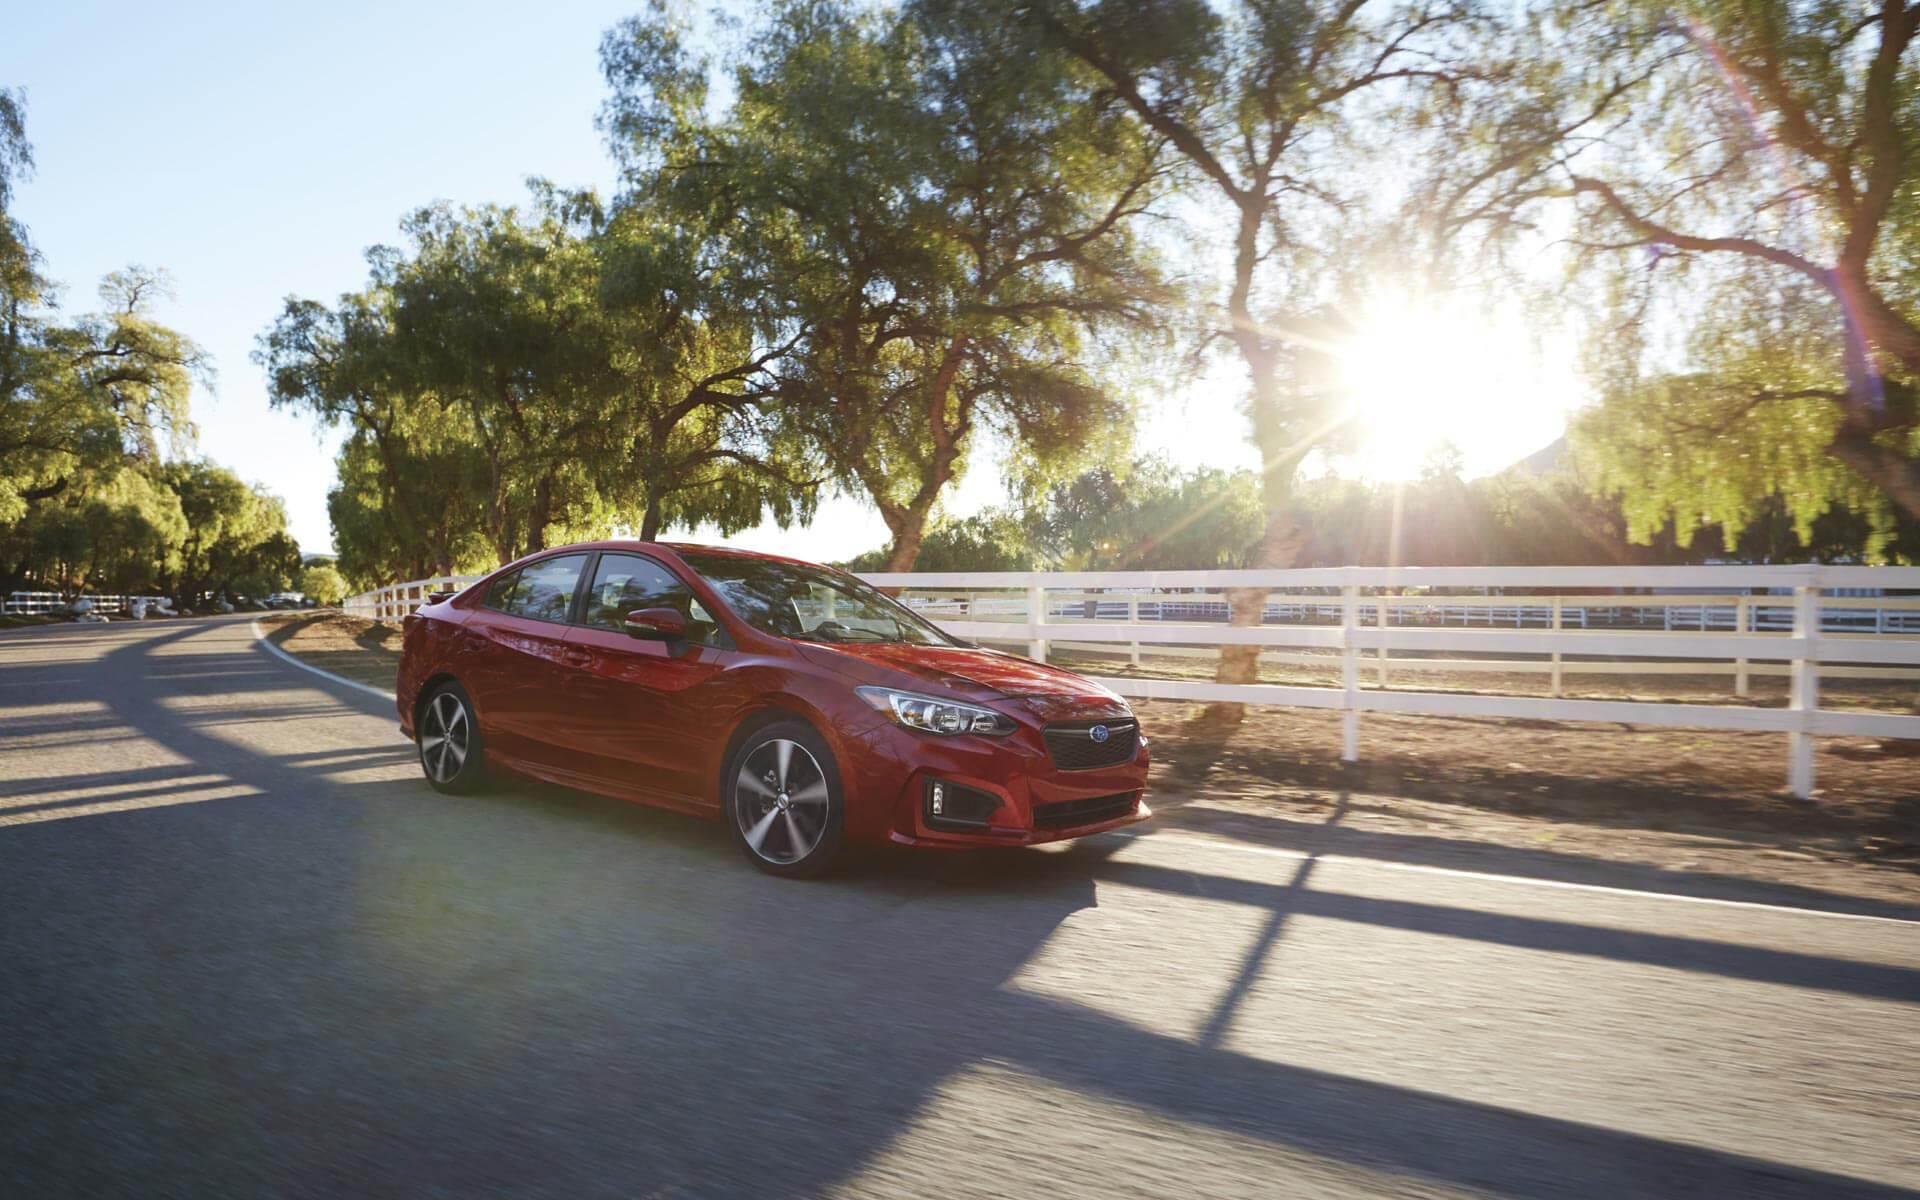 2018 Subaru Impreza Financing near Folsom, CA